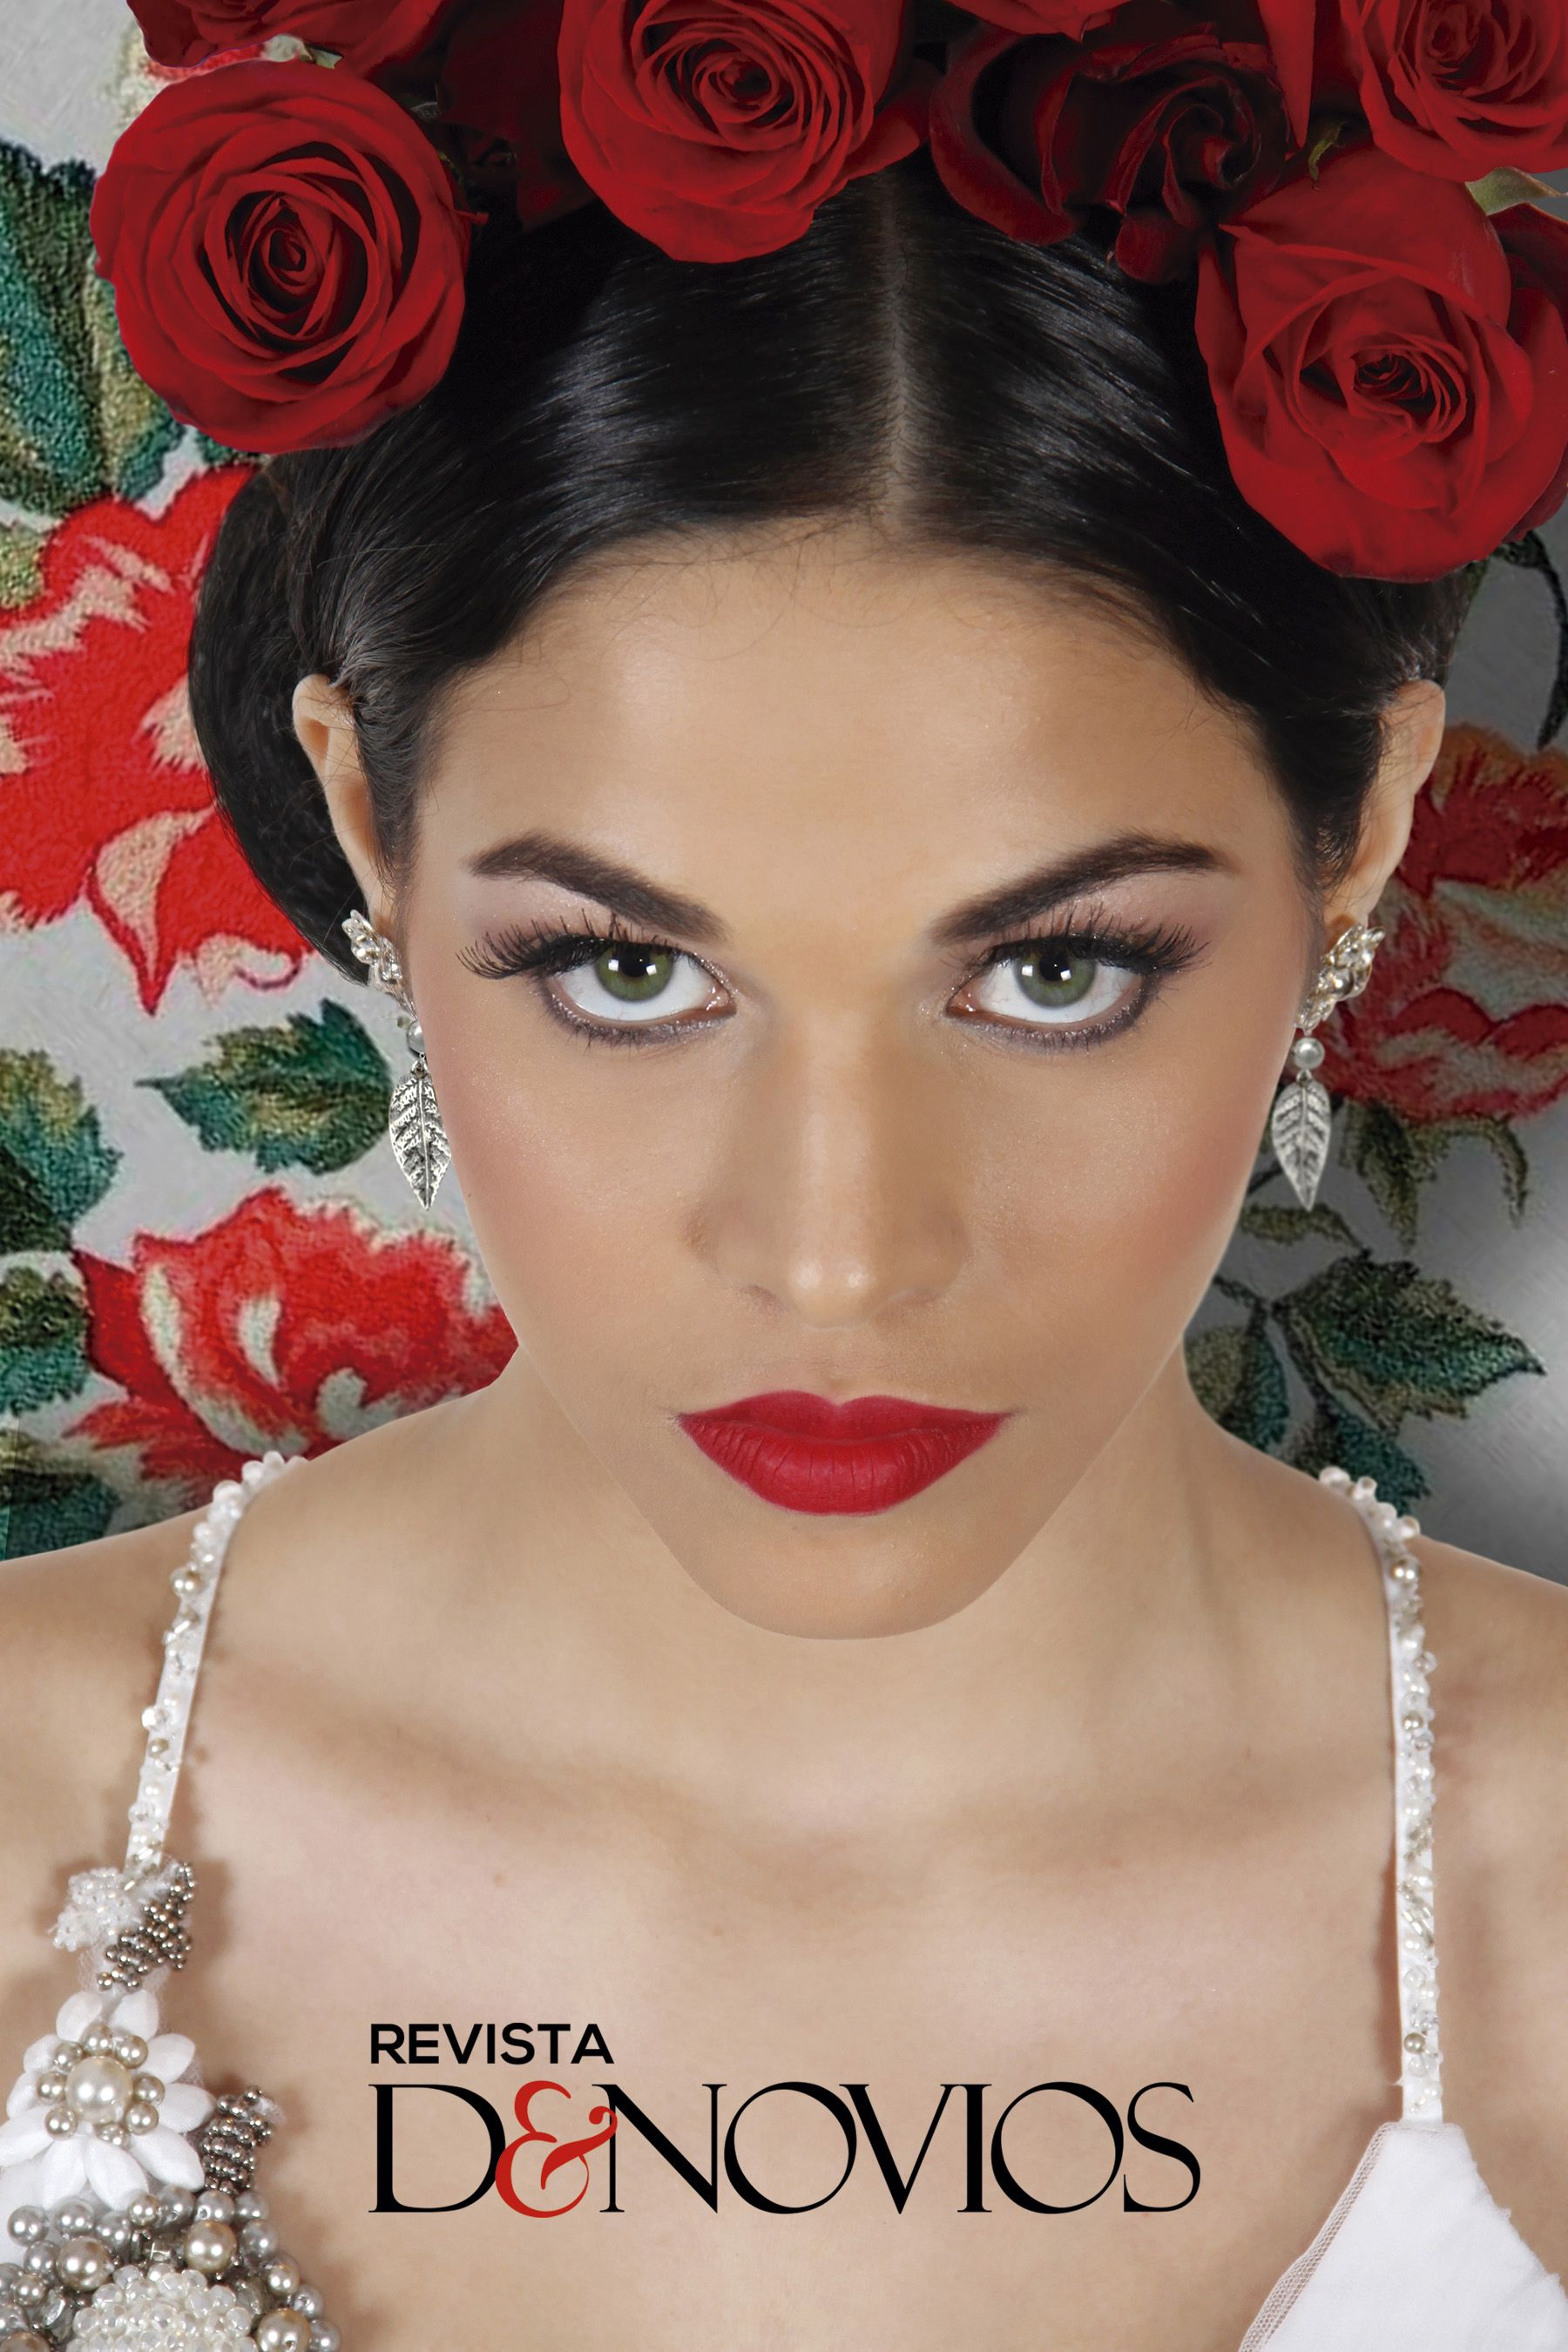 Vestido: Perú Bridal, 791 4030; Fotografía: Imagen Urbana T. 349 1320, www.imagenurbana.com; Maquillaje y peinado: Jéssica Aranda de Jes Beauty Art T. 957 561 868; Modelo: Sirena Ortiz